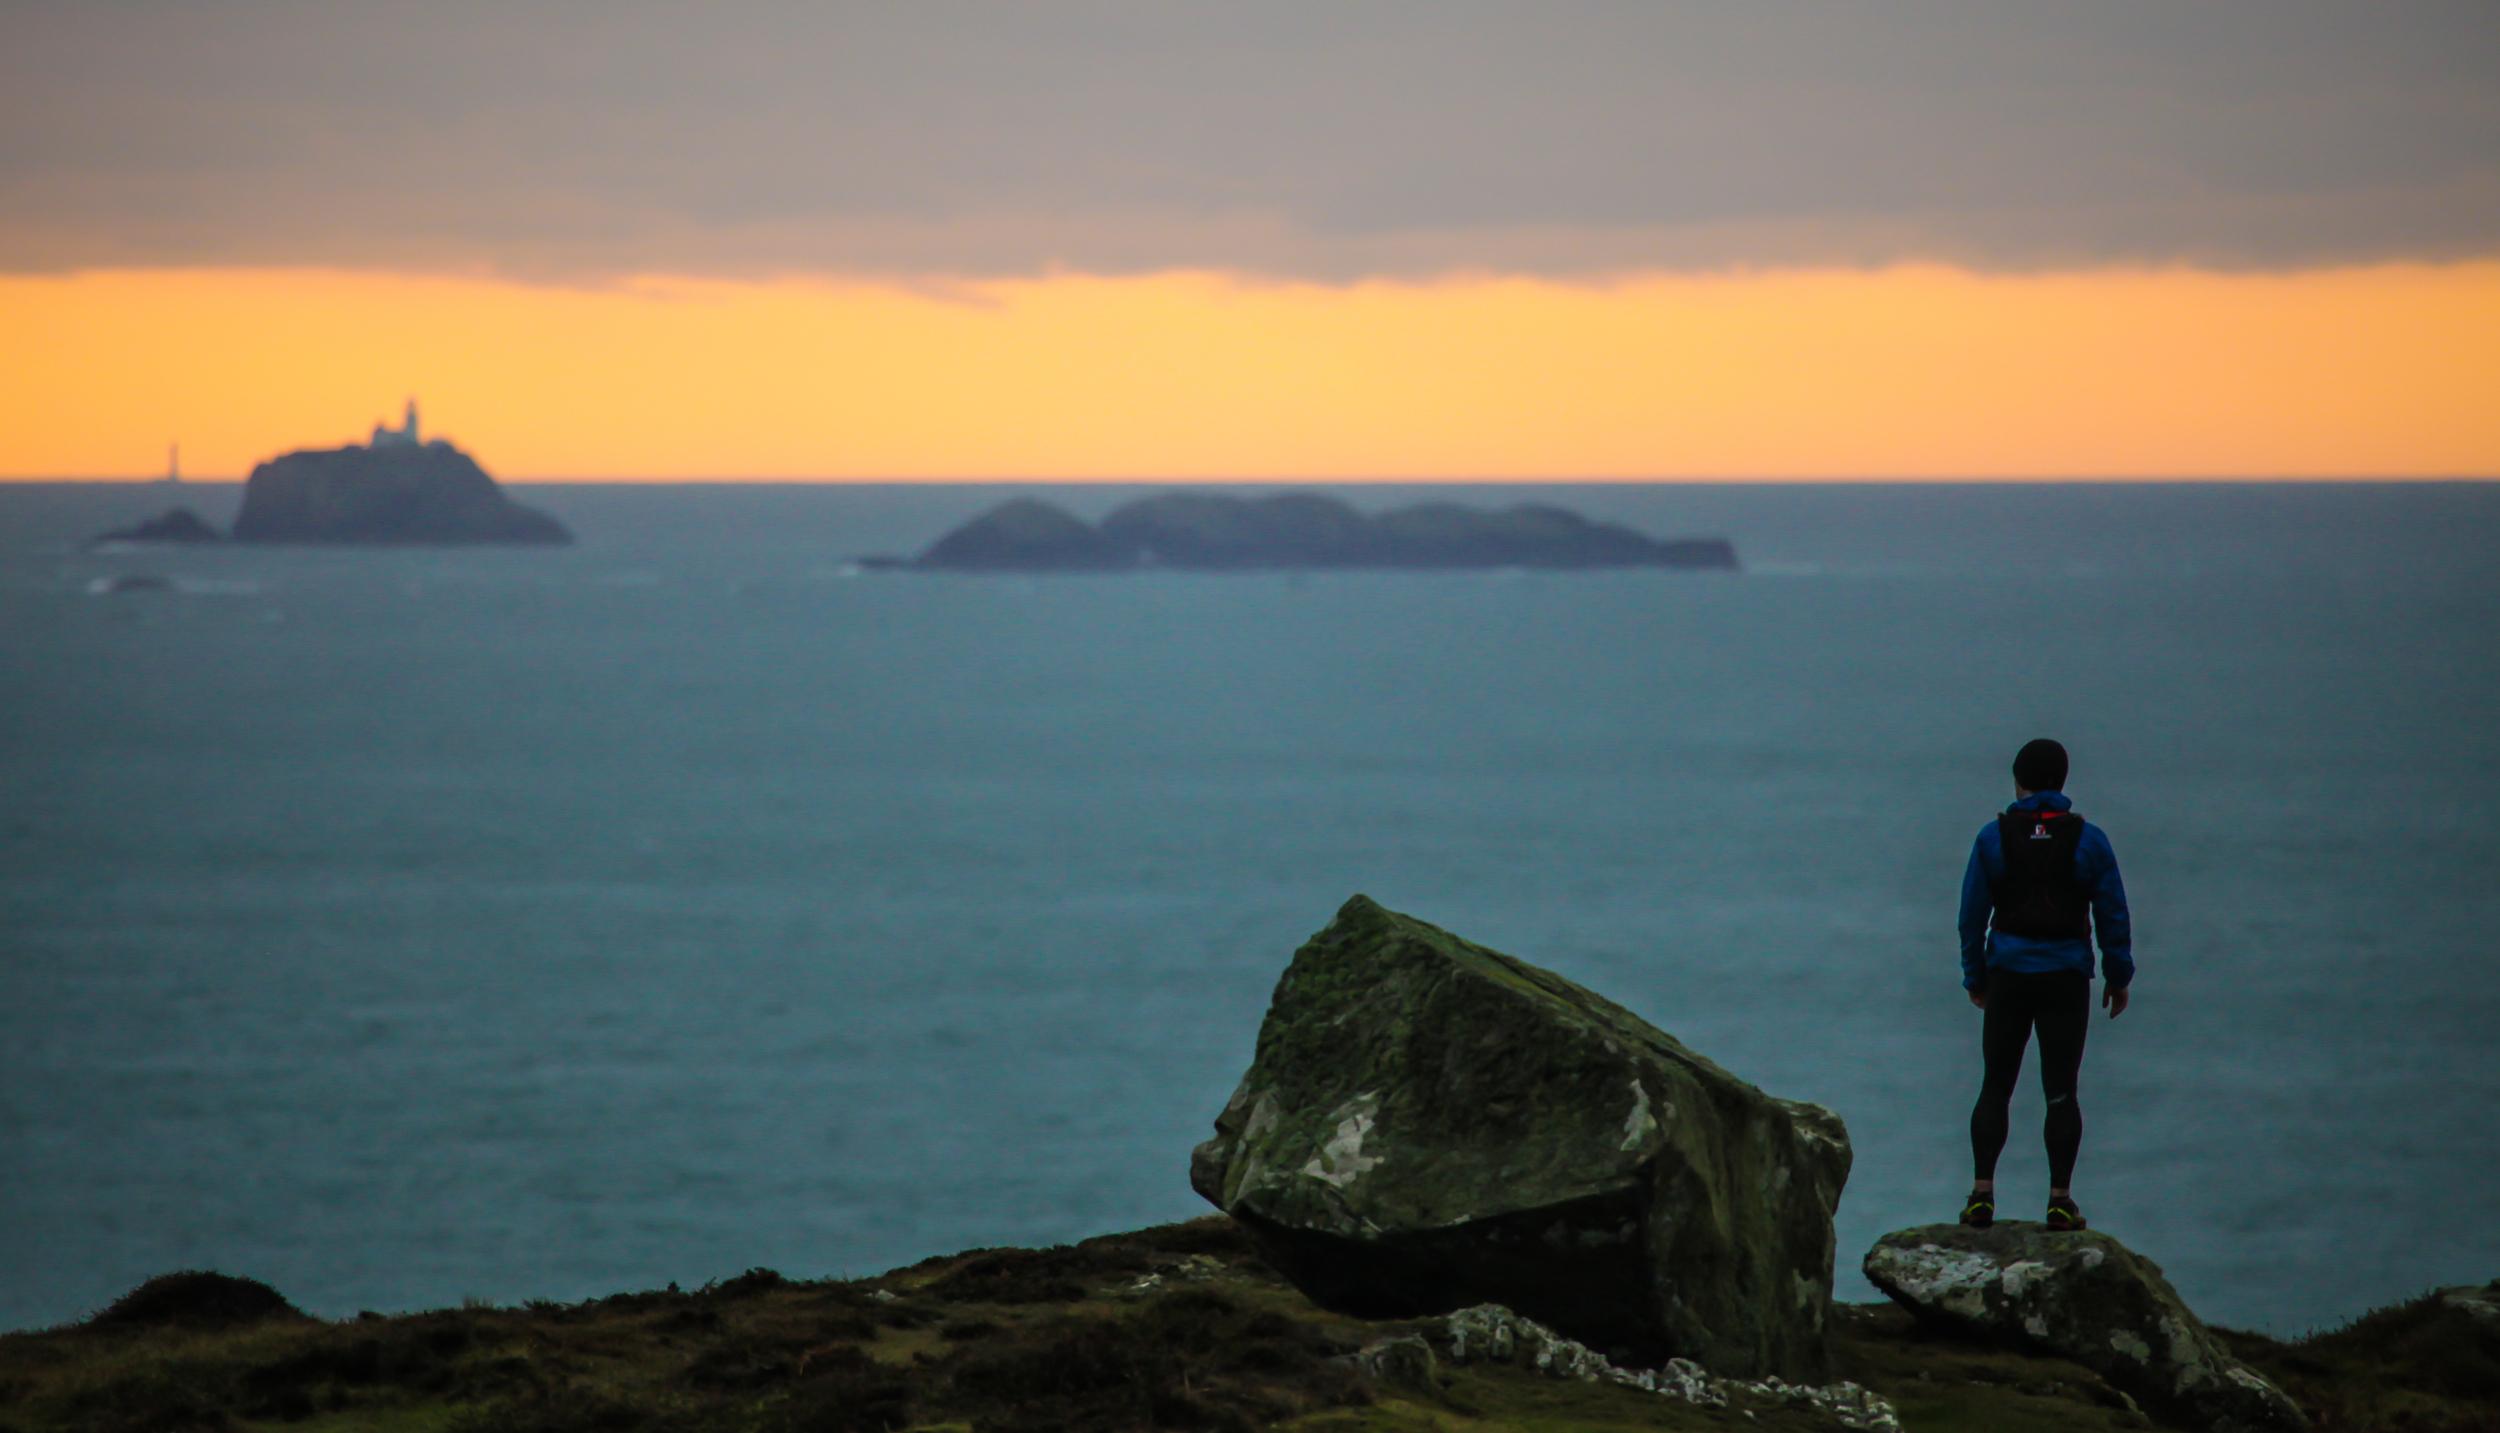 Great British MINI Adventure Day 10 - Trail Running the Pembrokeshire Coast